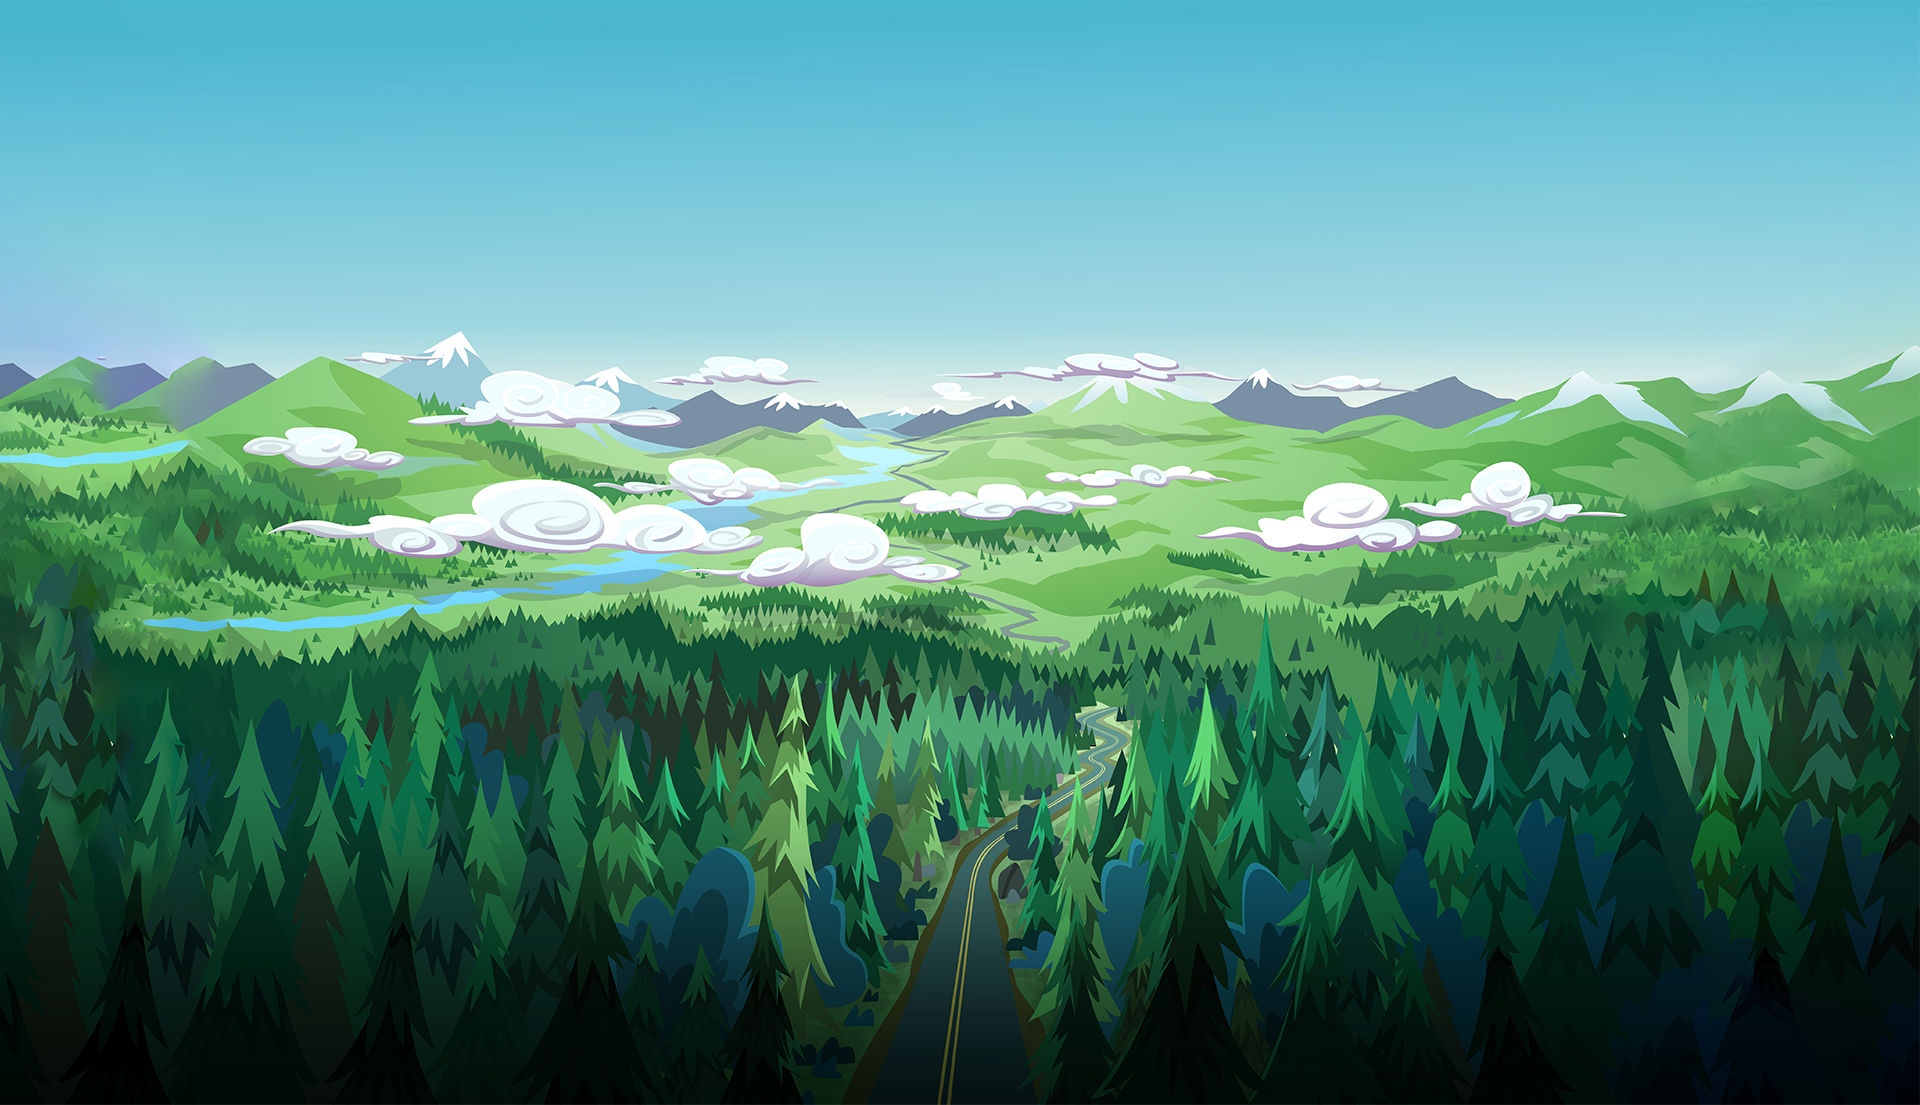 1195735__safe_tree_background_scenery_ro